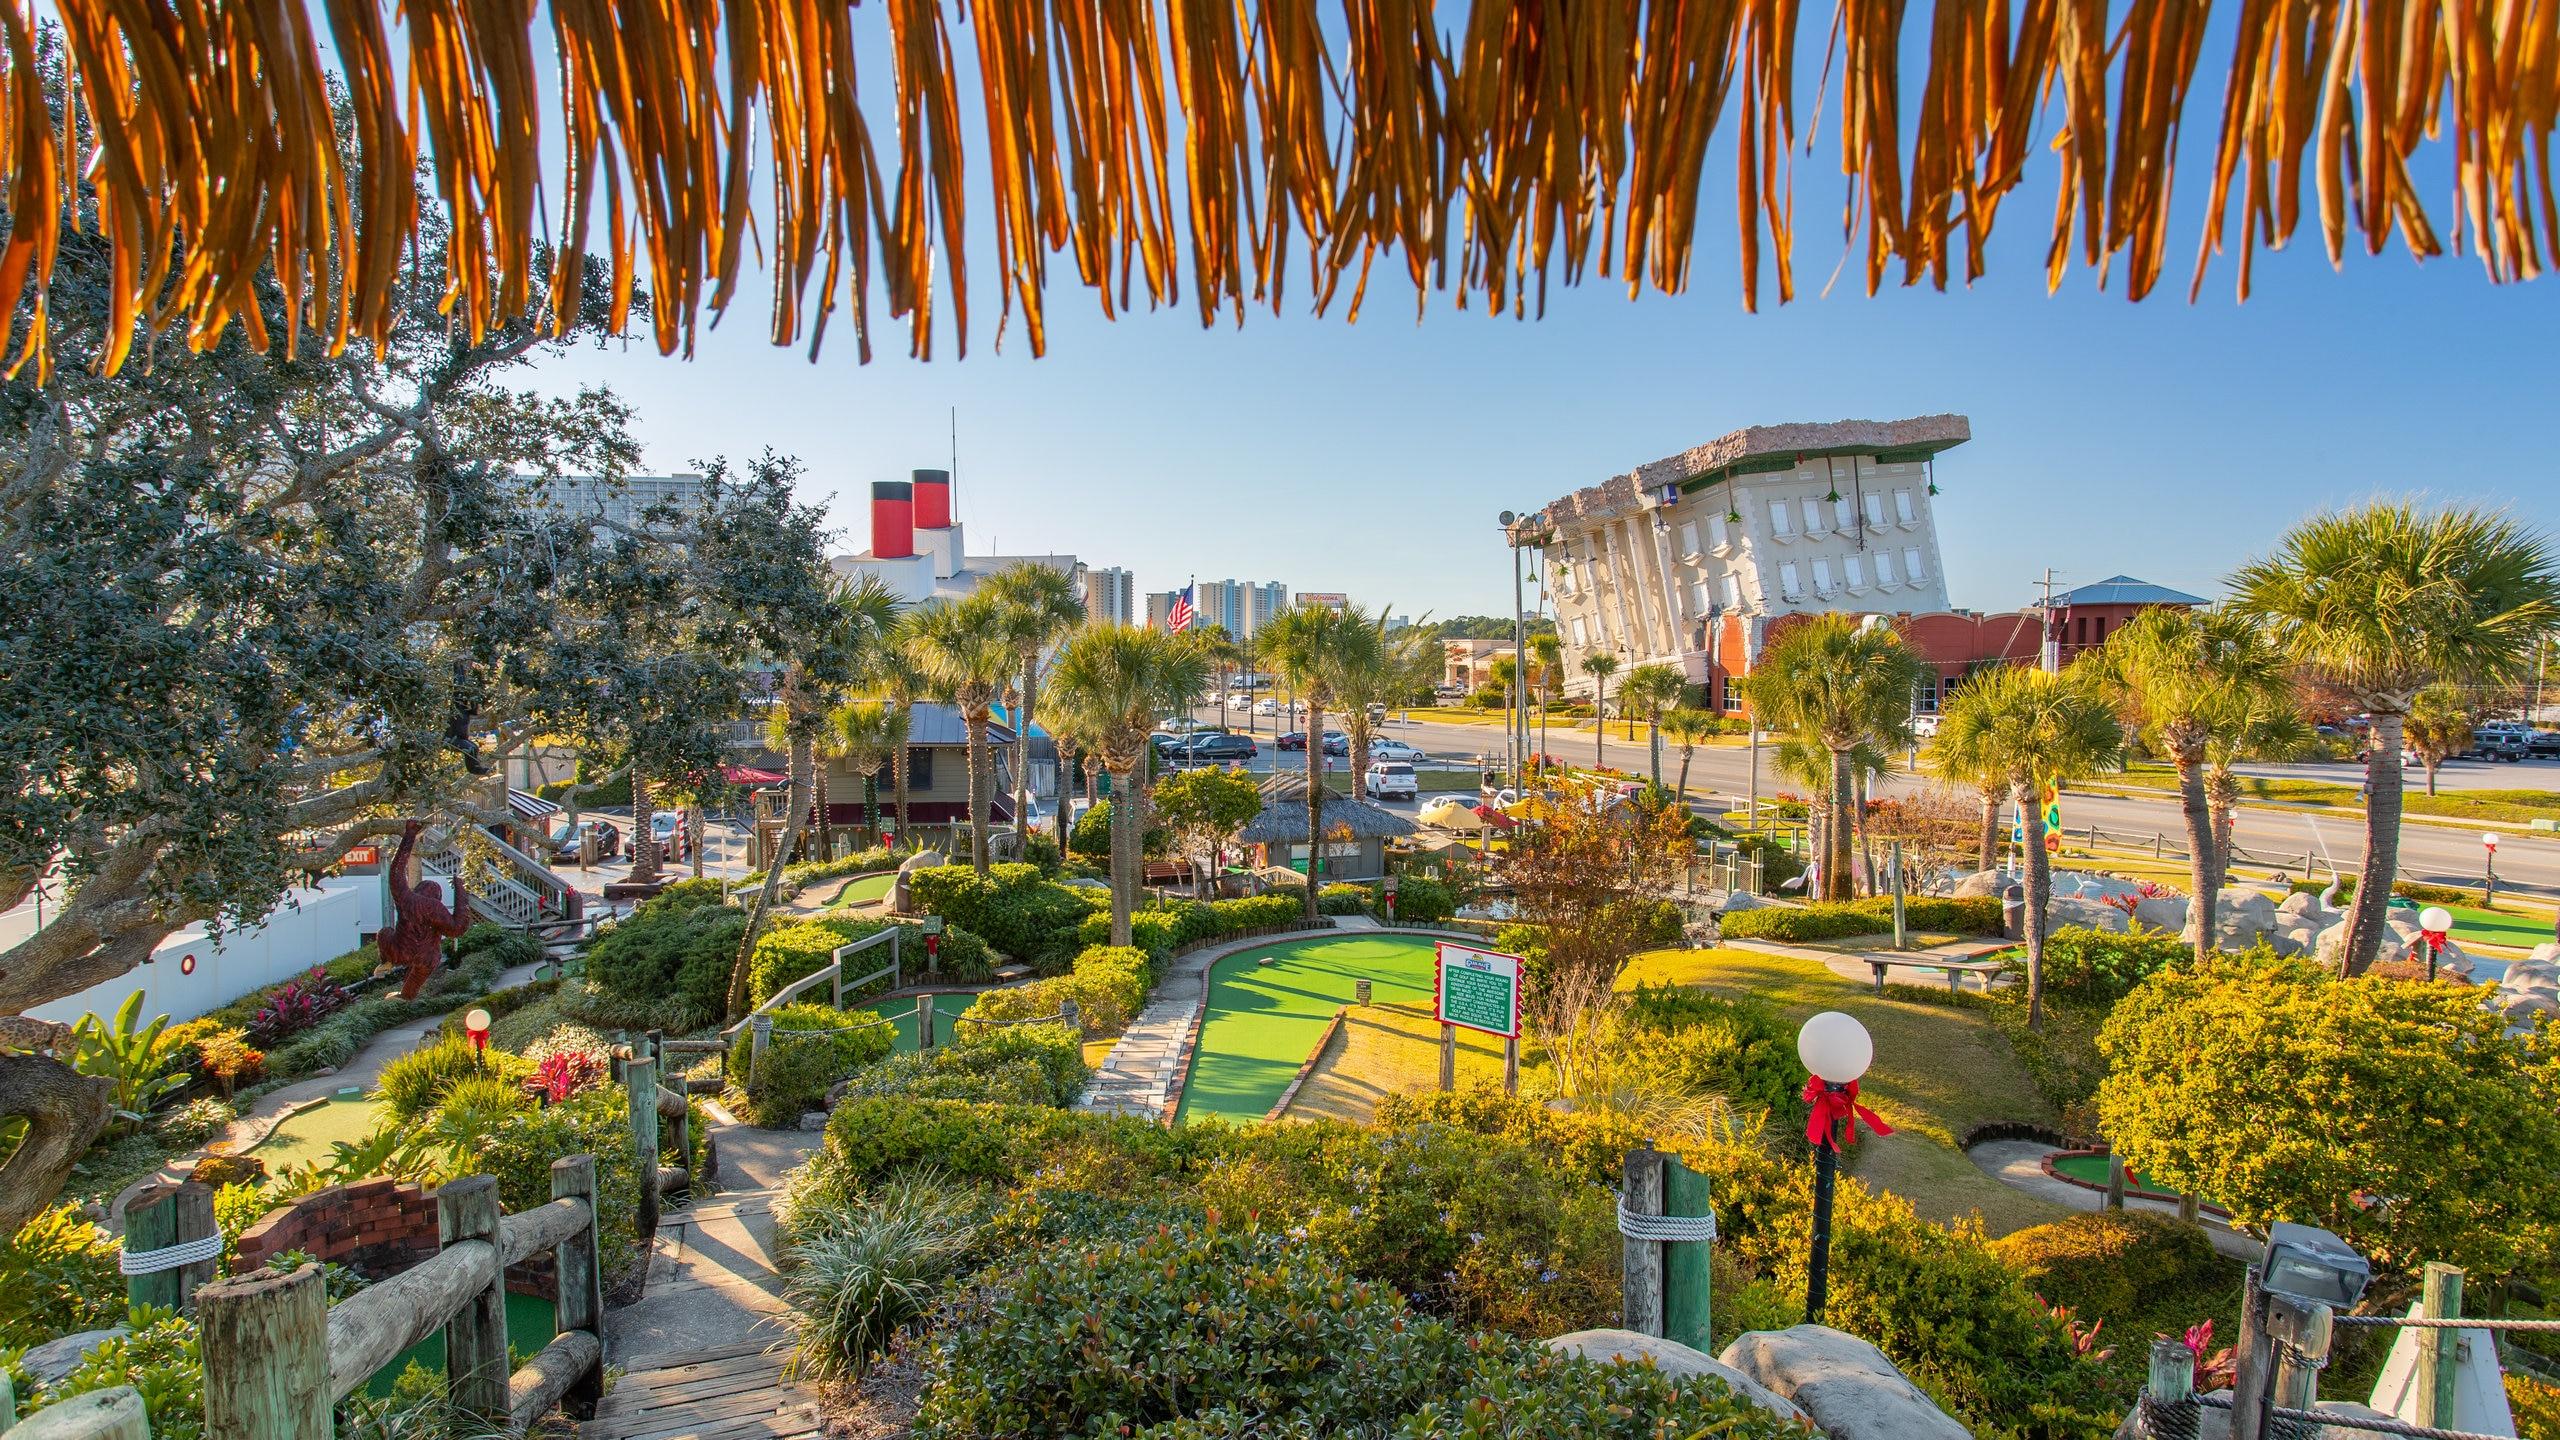 Coconut Creek Family Fun Park, Panama City Beach, Florida, United States of America